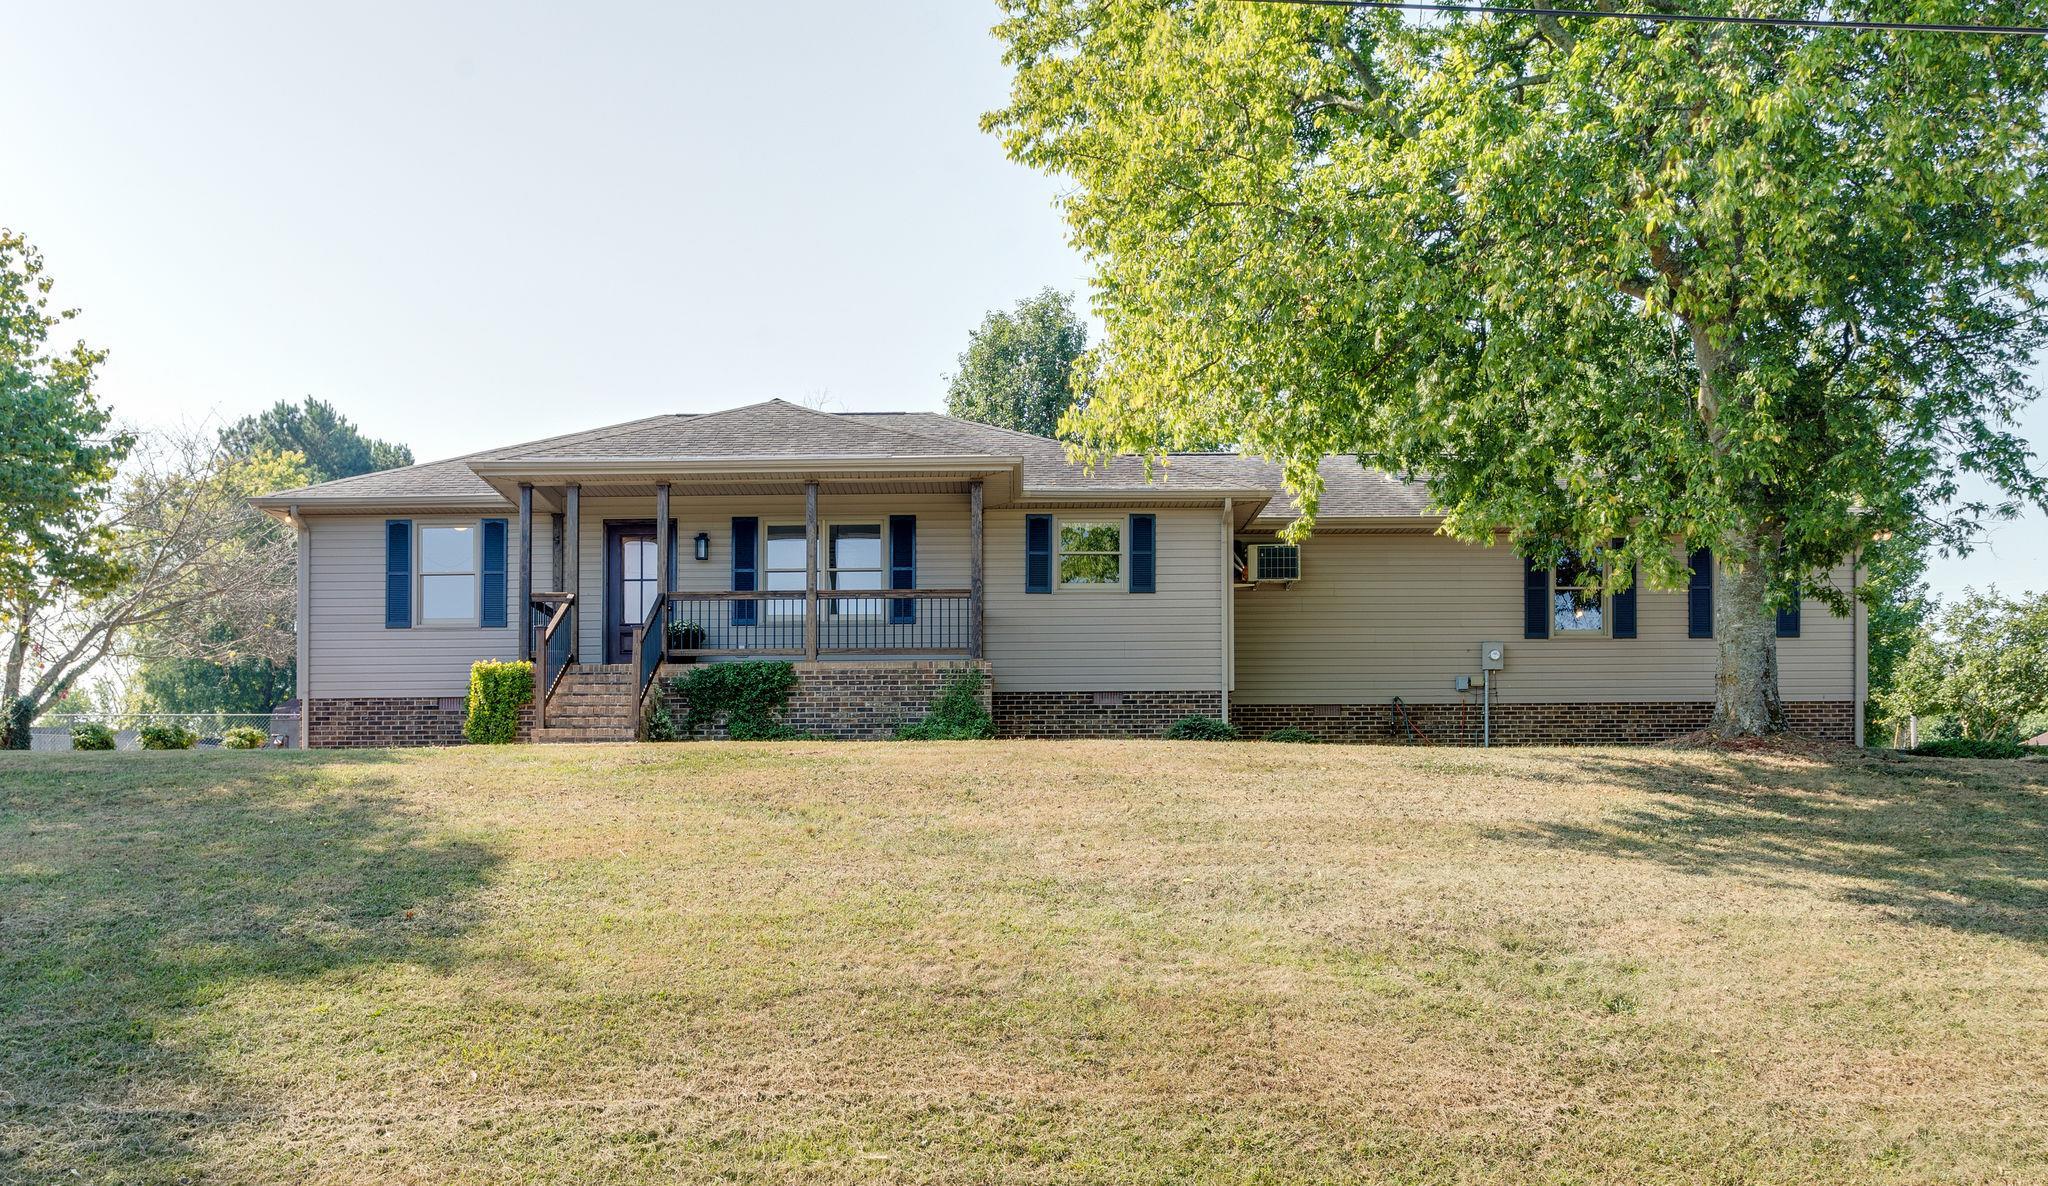 155 Jills Lndg, Winchester, TN 37398 - Winchester, TN real estate listing